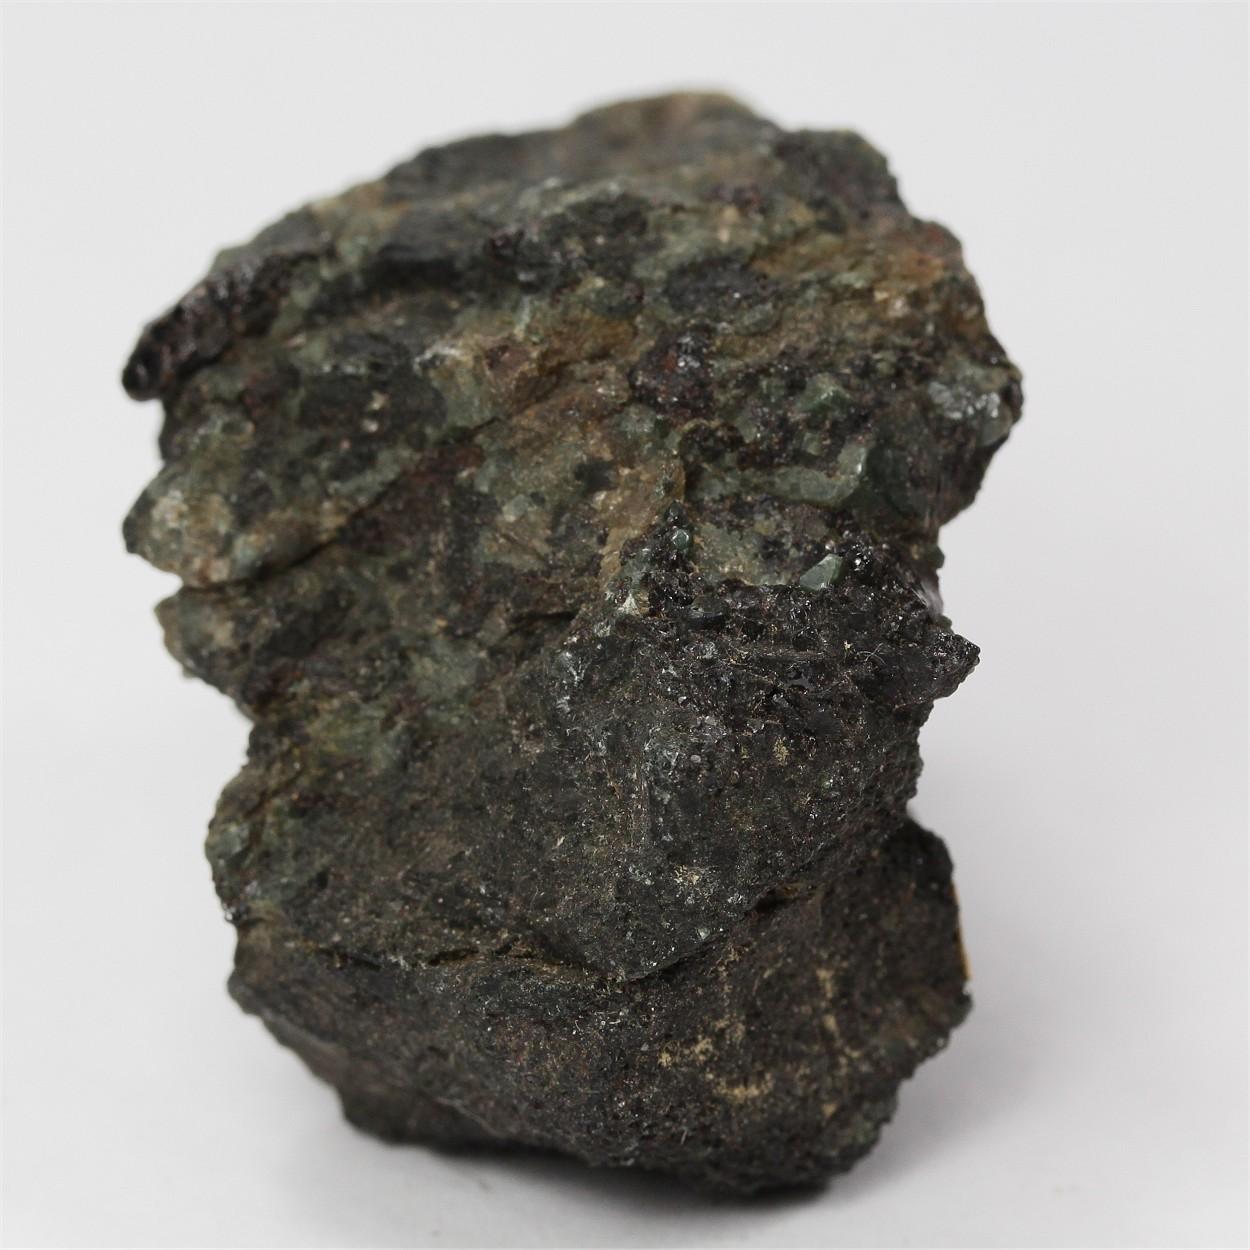 Meionite